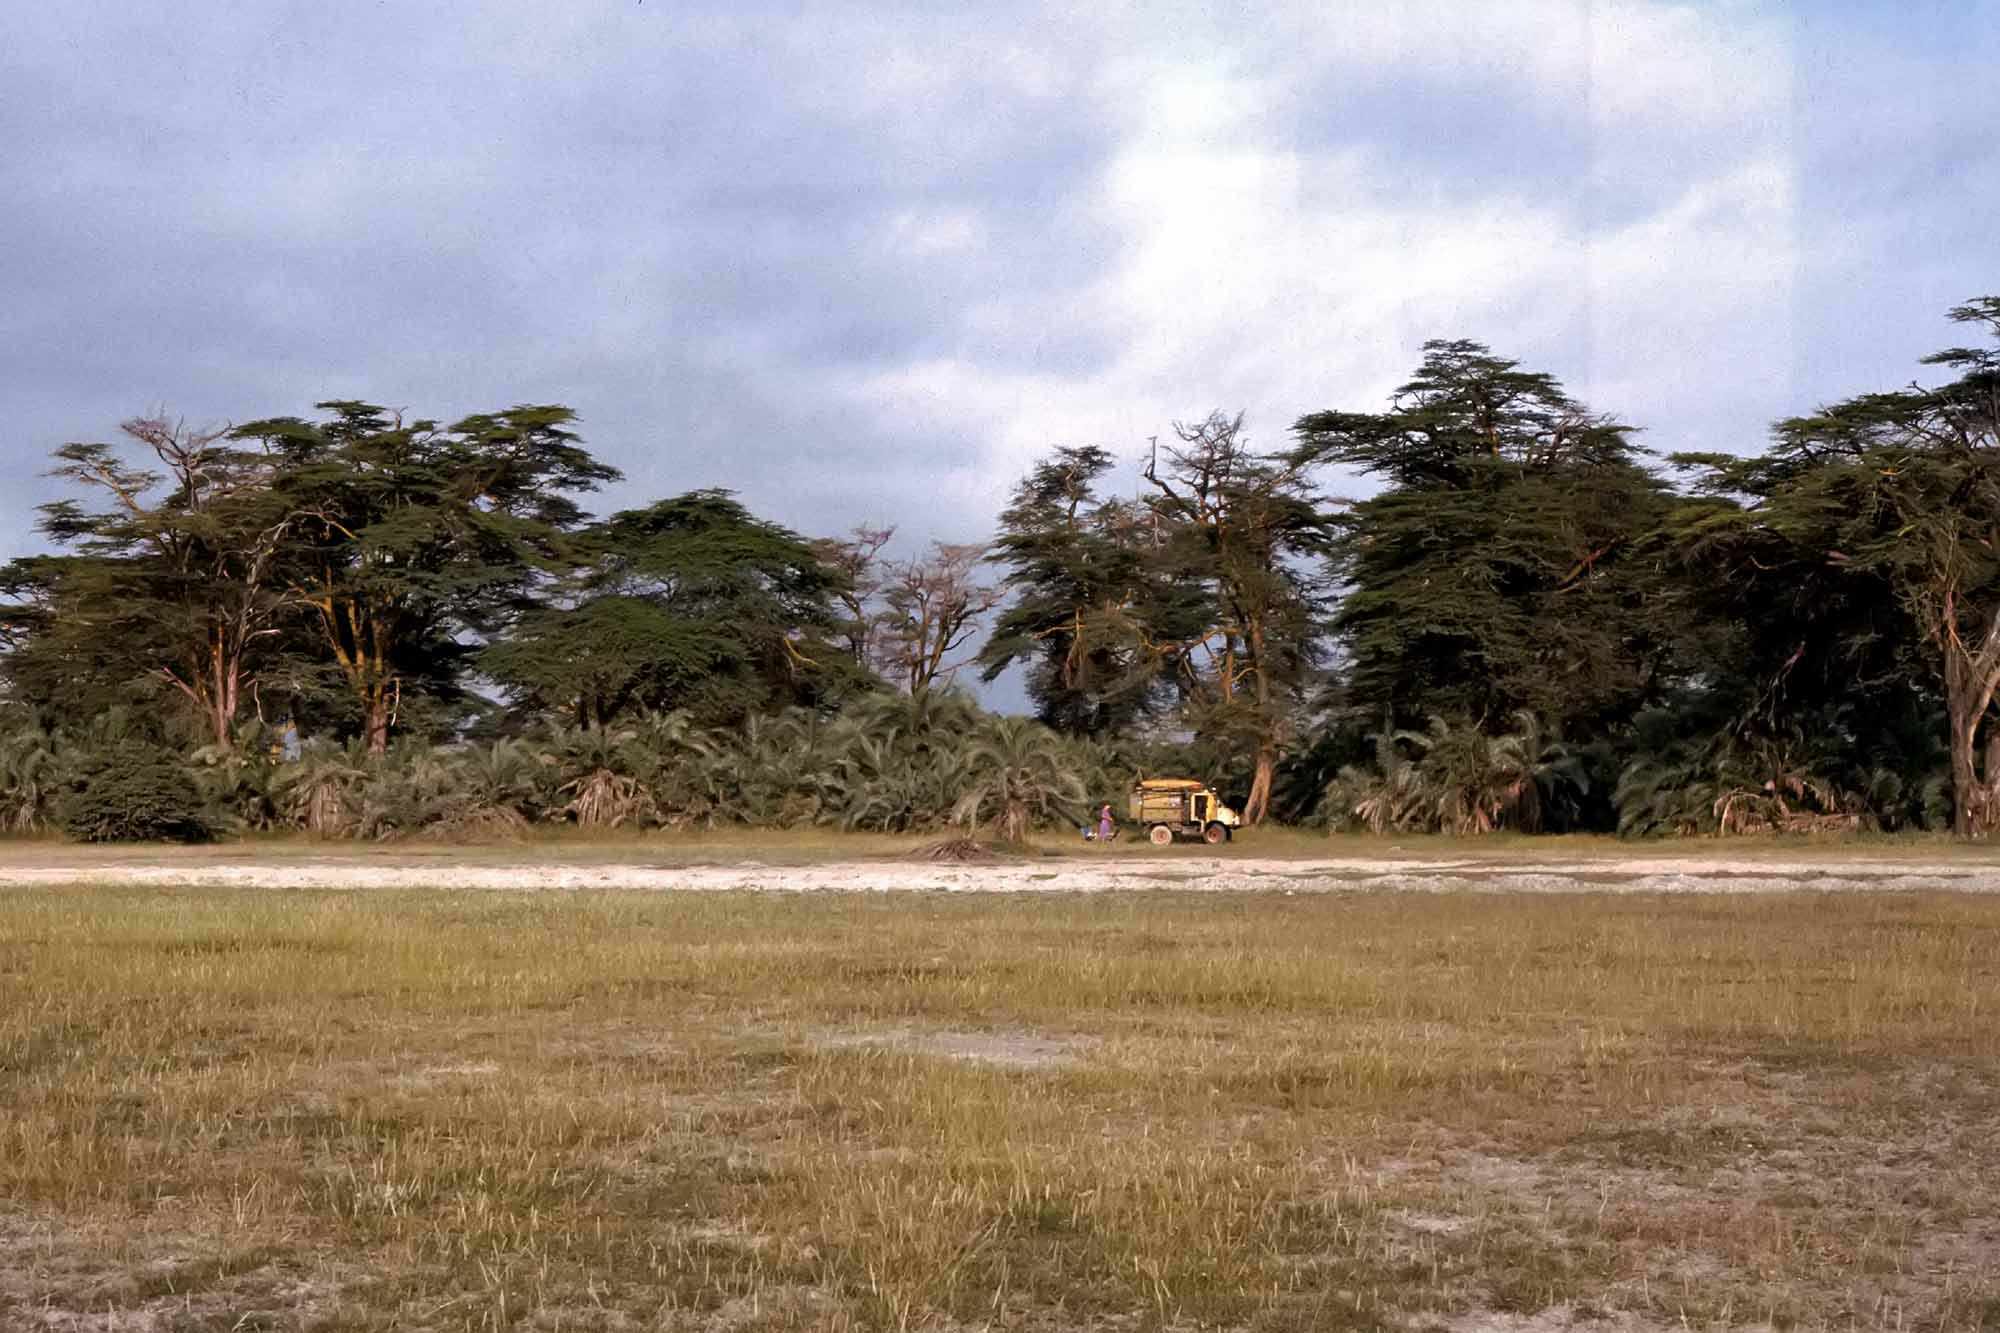 camping-kenya-amboseli-national-park-africa-unimog